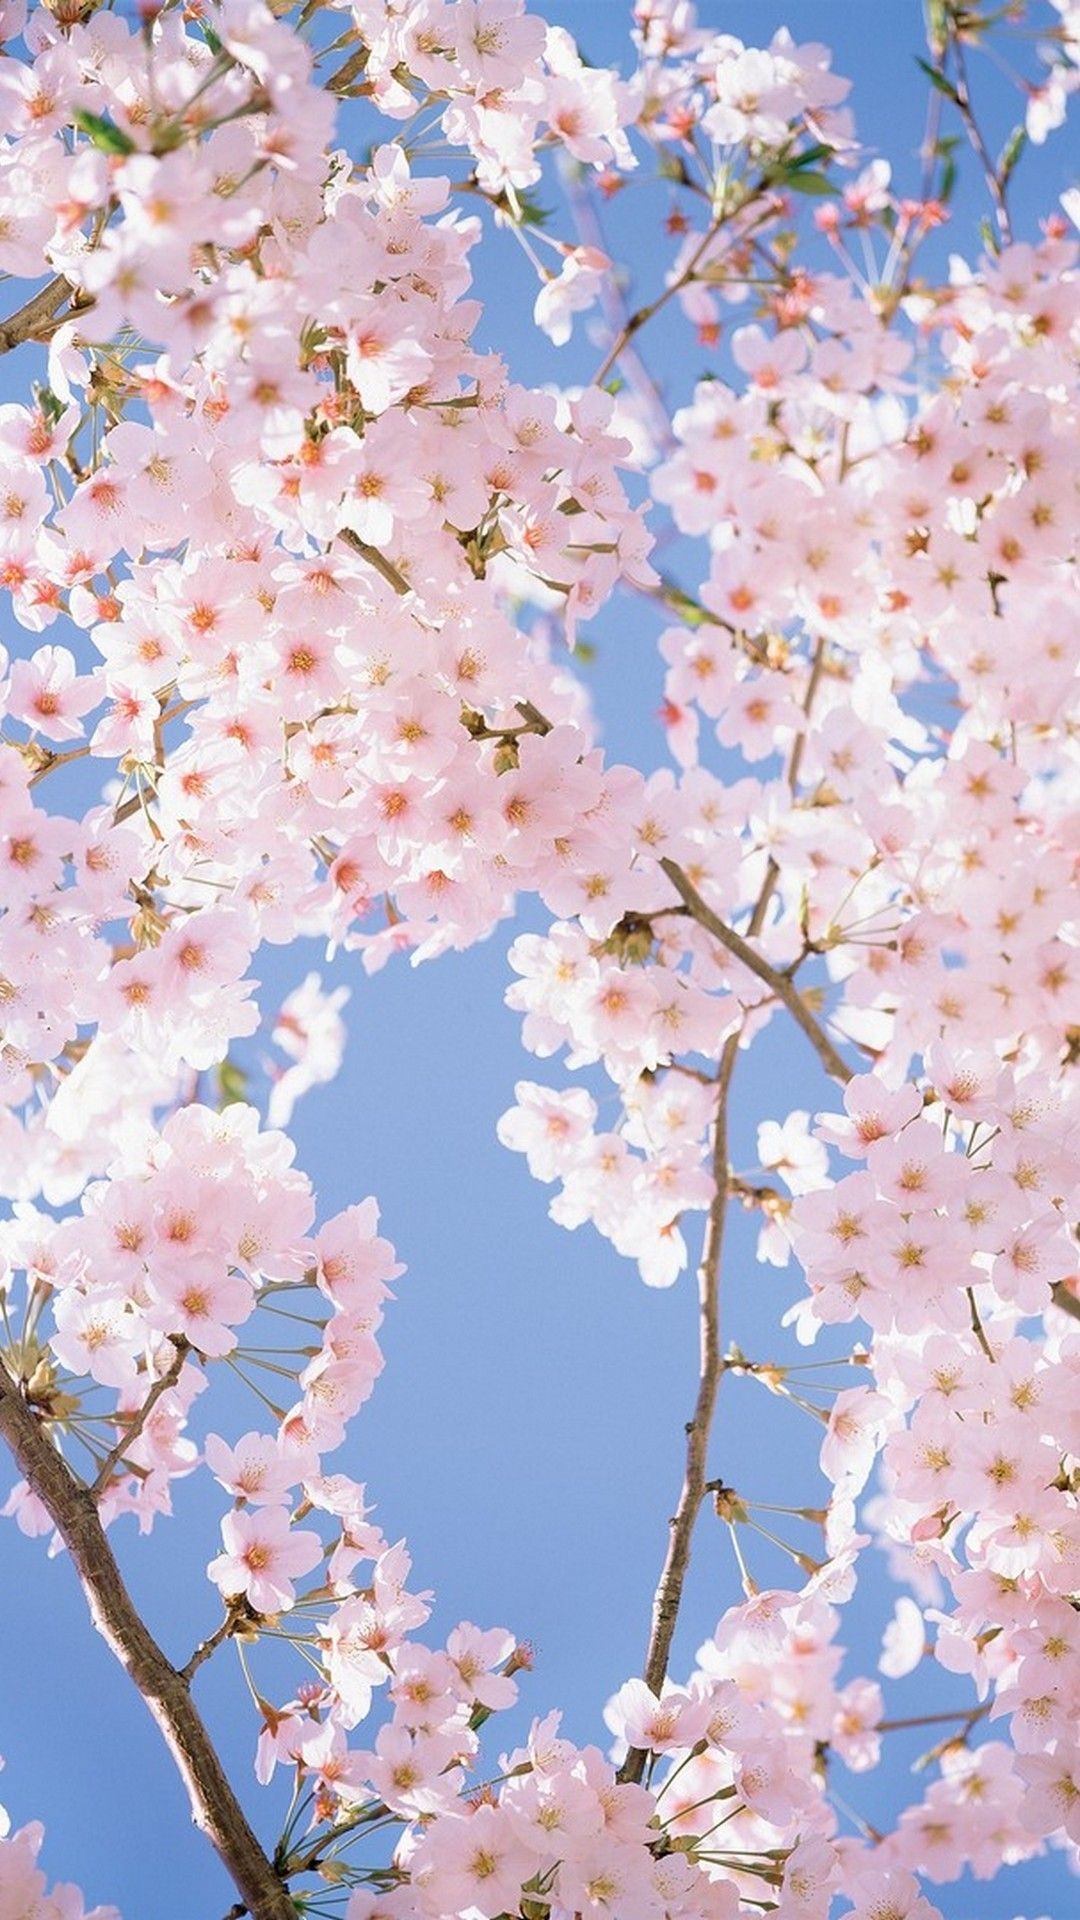 White Flower HD Wallpapers For Mobile Flower phone